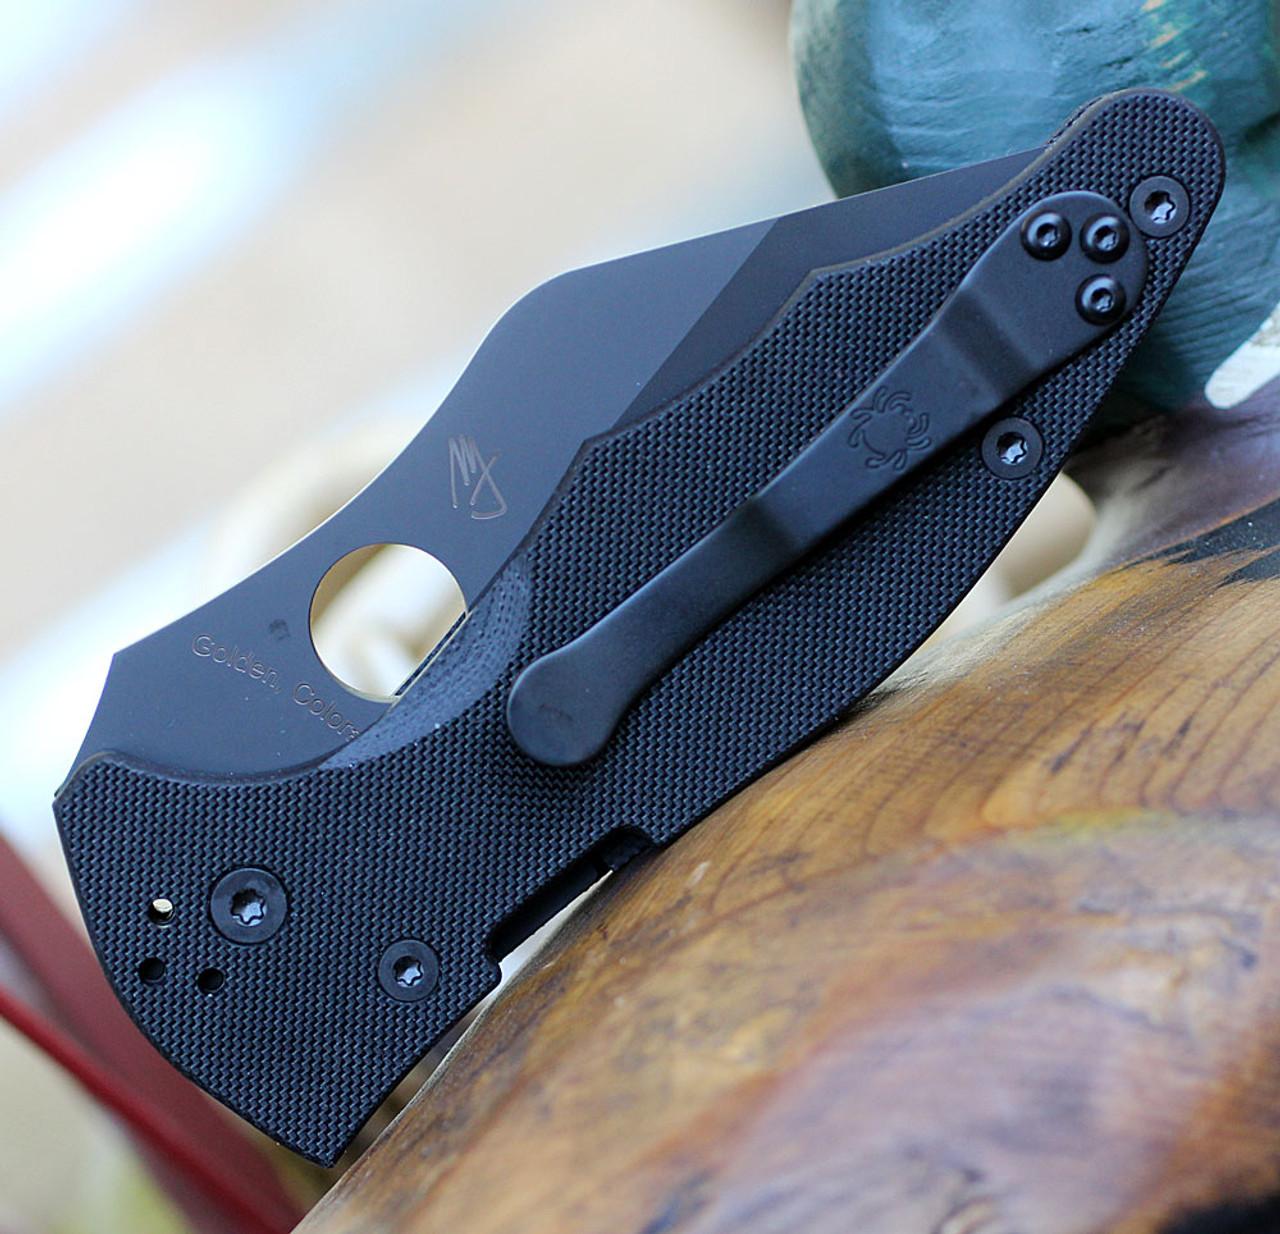 "Spyderco Yojimbo 2 C85GPBBK2, 3.20"" CPM S30V Black Plain Blade, Black G-10 Handle"